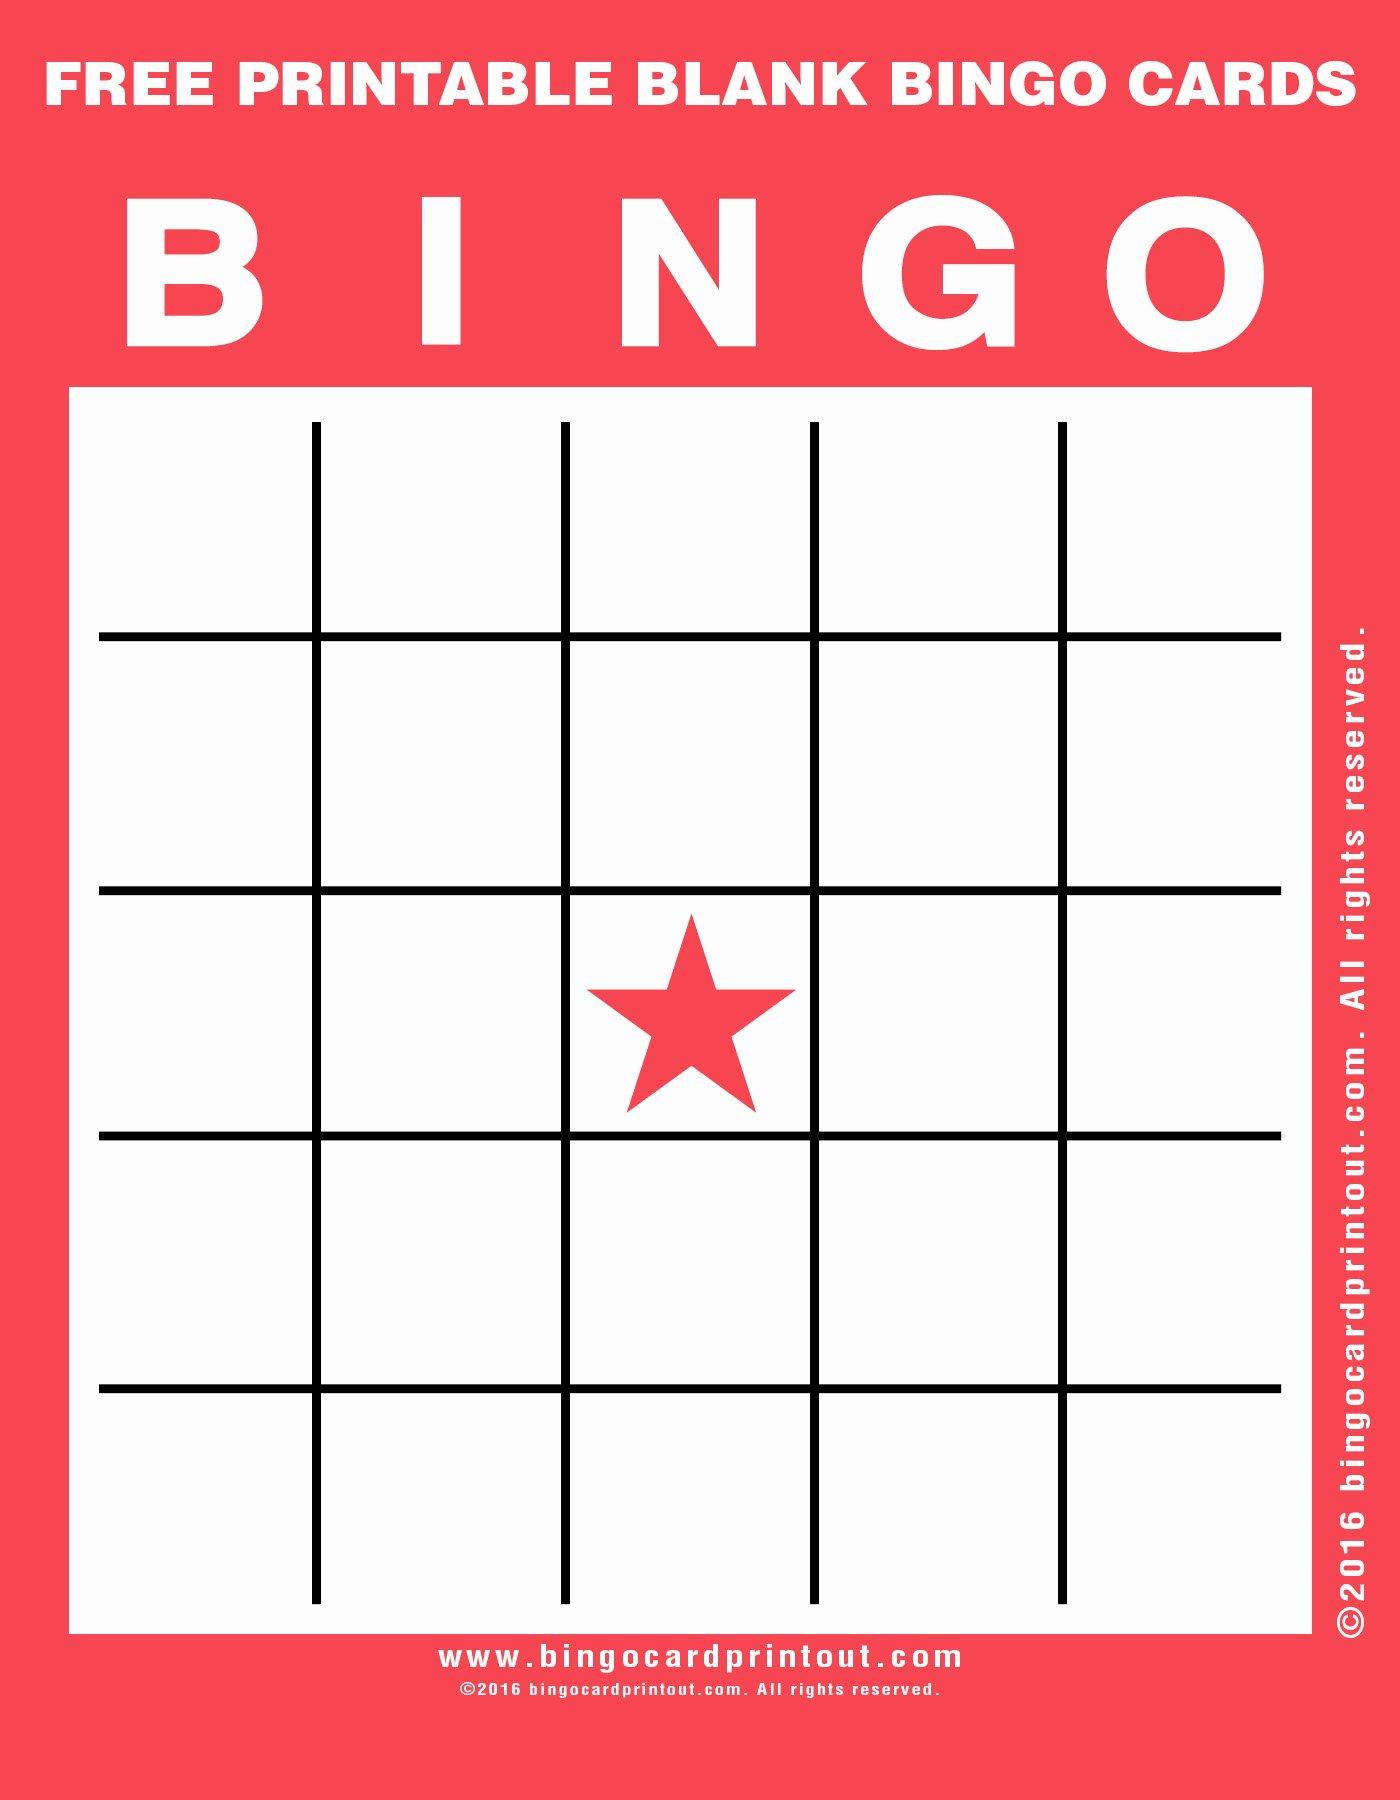 Free Blank Bingo Cards New Free Printable Blank Bingo Cards Bingocardprintout